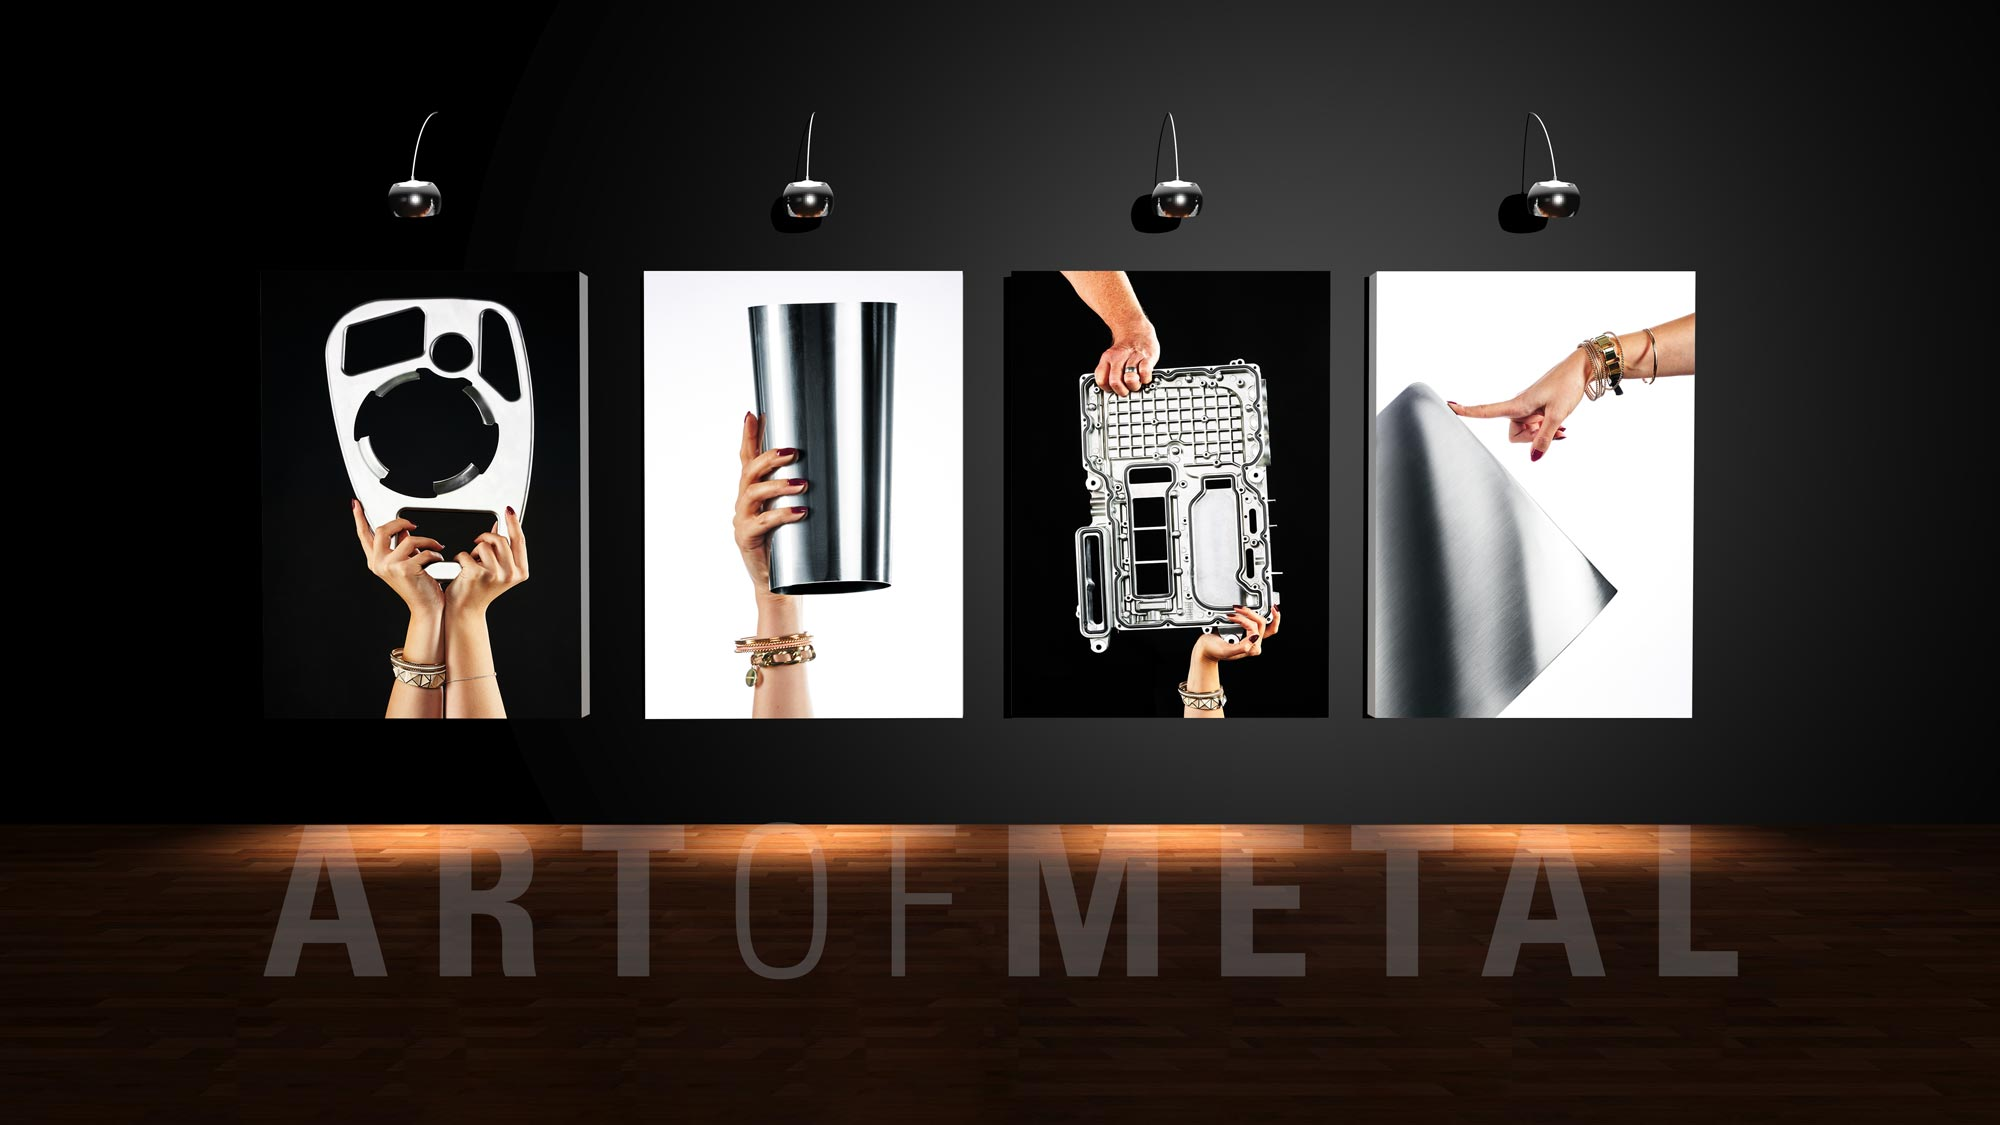 MICHELFELDER Art of Metal Galerie